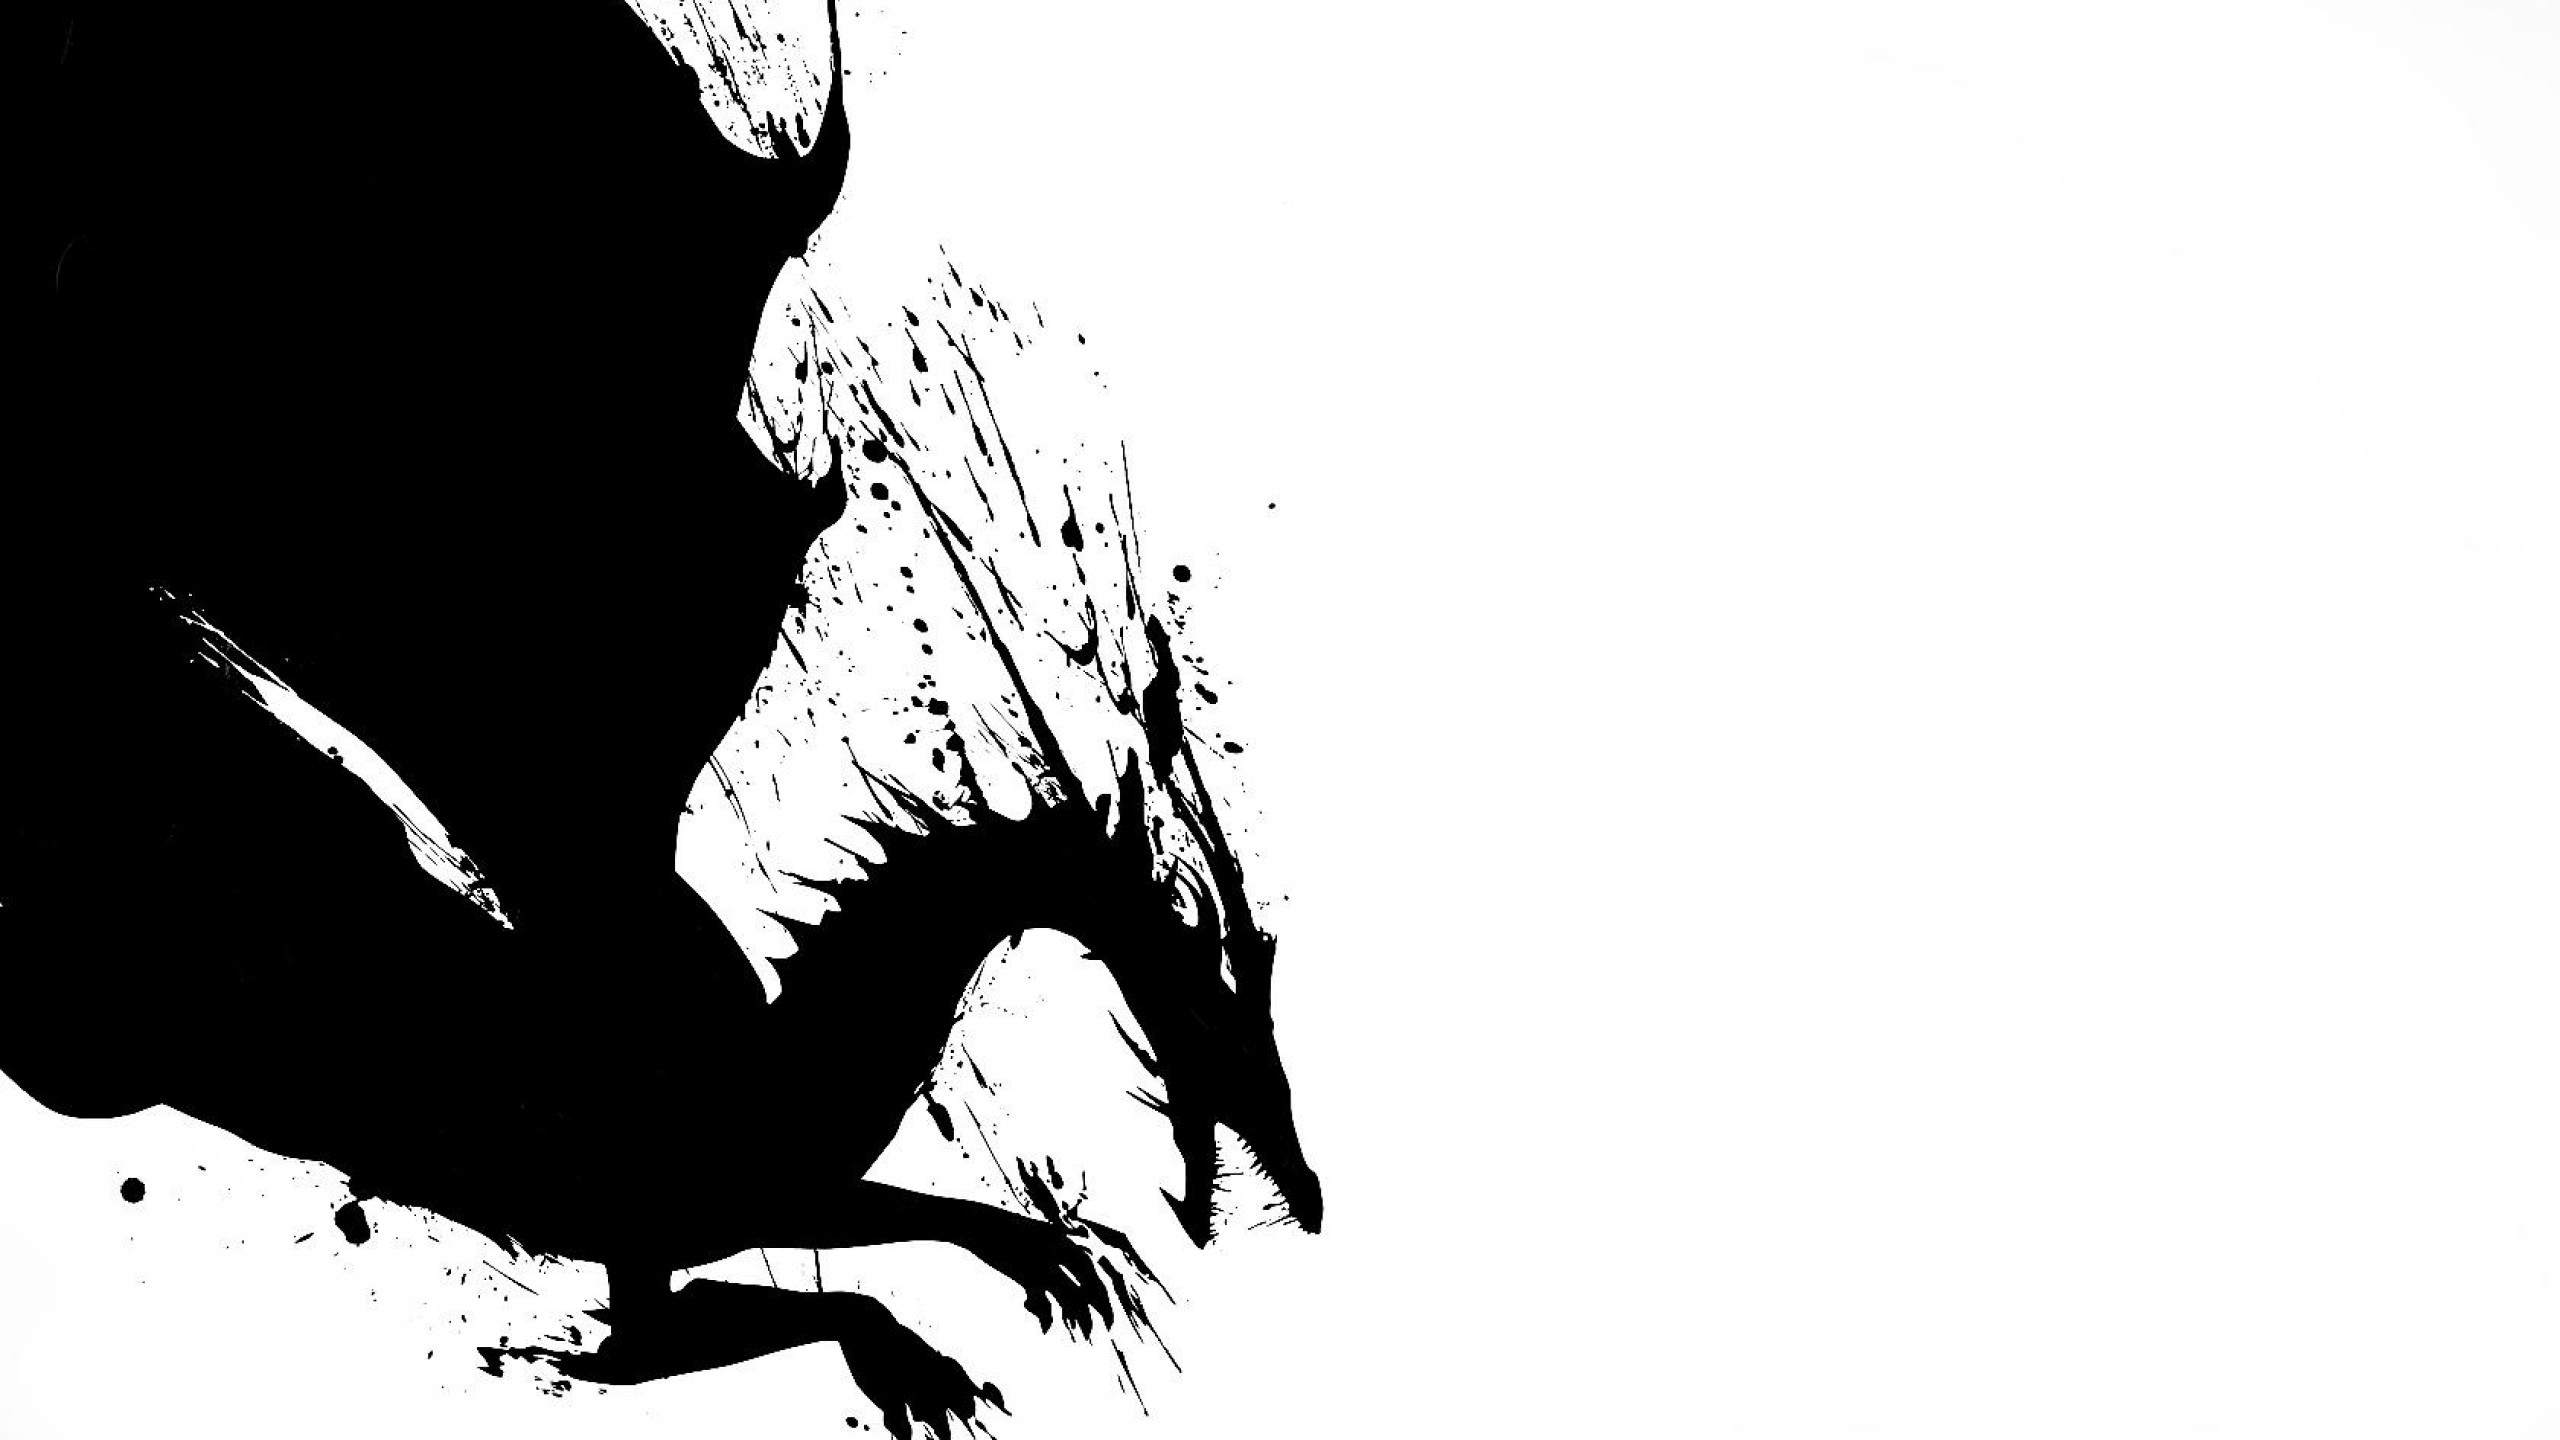 White And Black Dragons Wallpaper 2d Dragon Black White Black